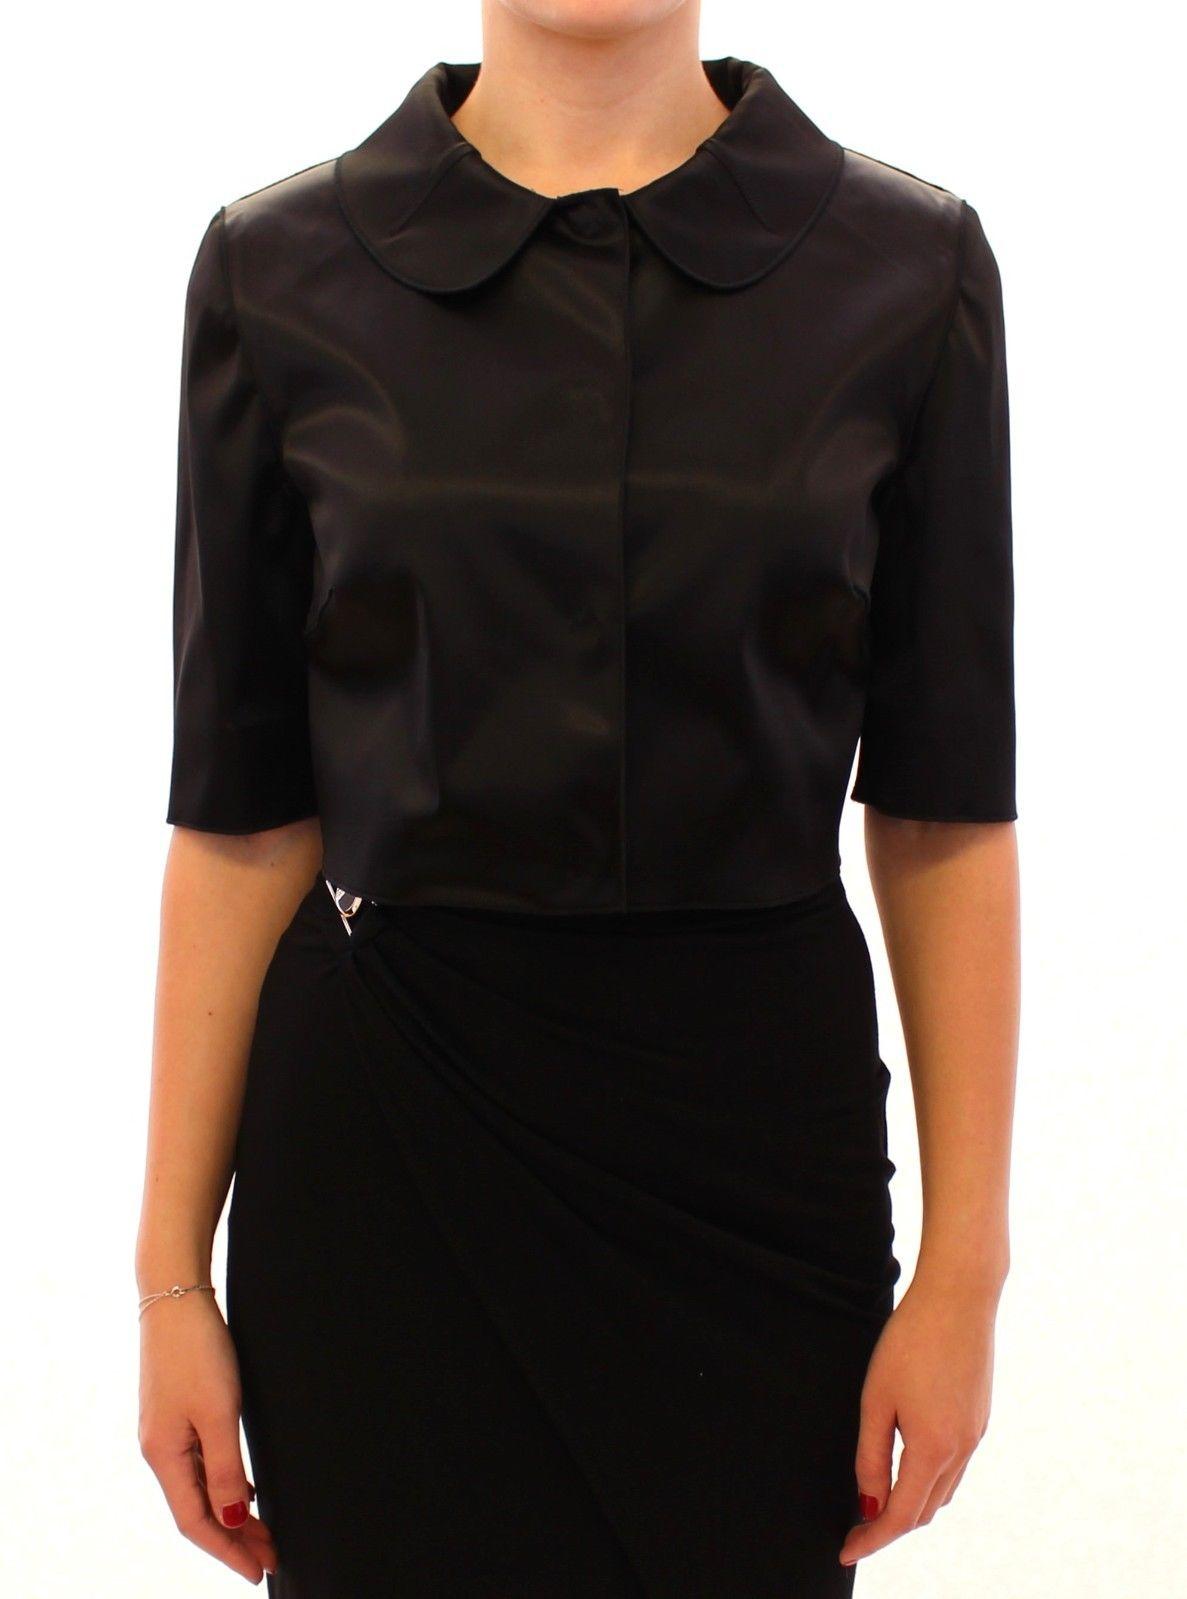 Dolce & Gabbana Women's Shiny Stretch Bolero Shrug Jacket Black GSS11368 - IT46|XL